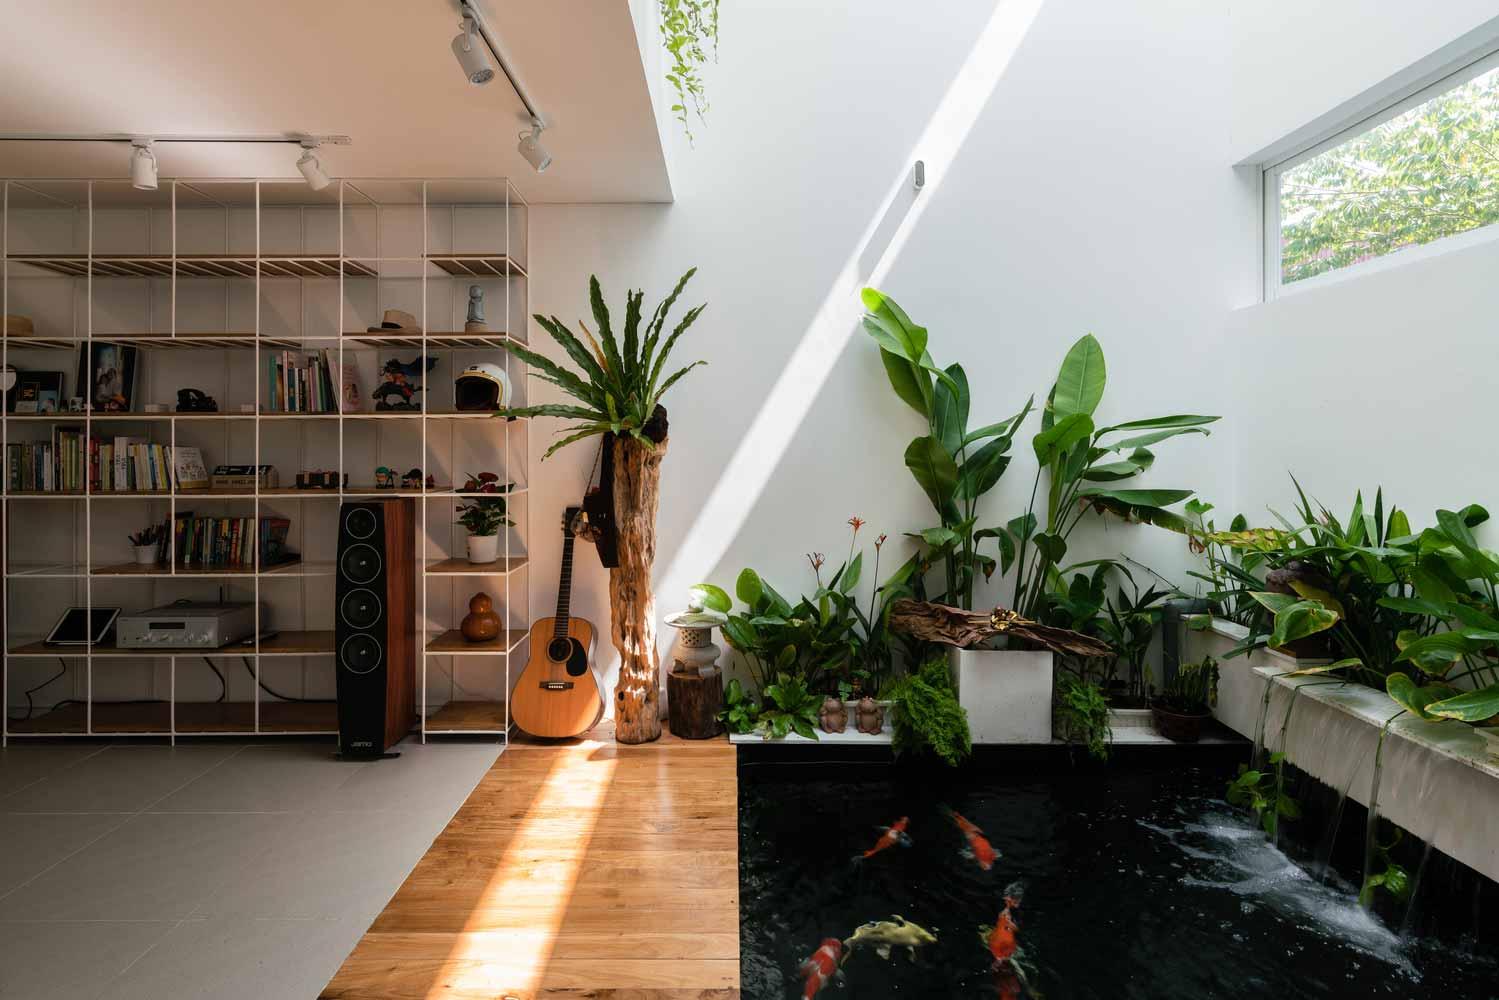 Interior rumah dilengkapi kolam ikan indoor, karya Q Concept // archdaily.com